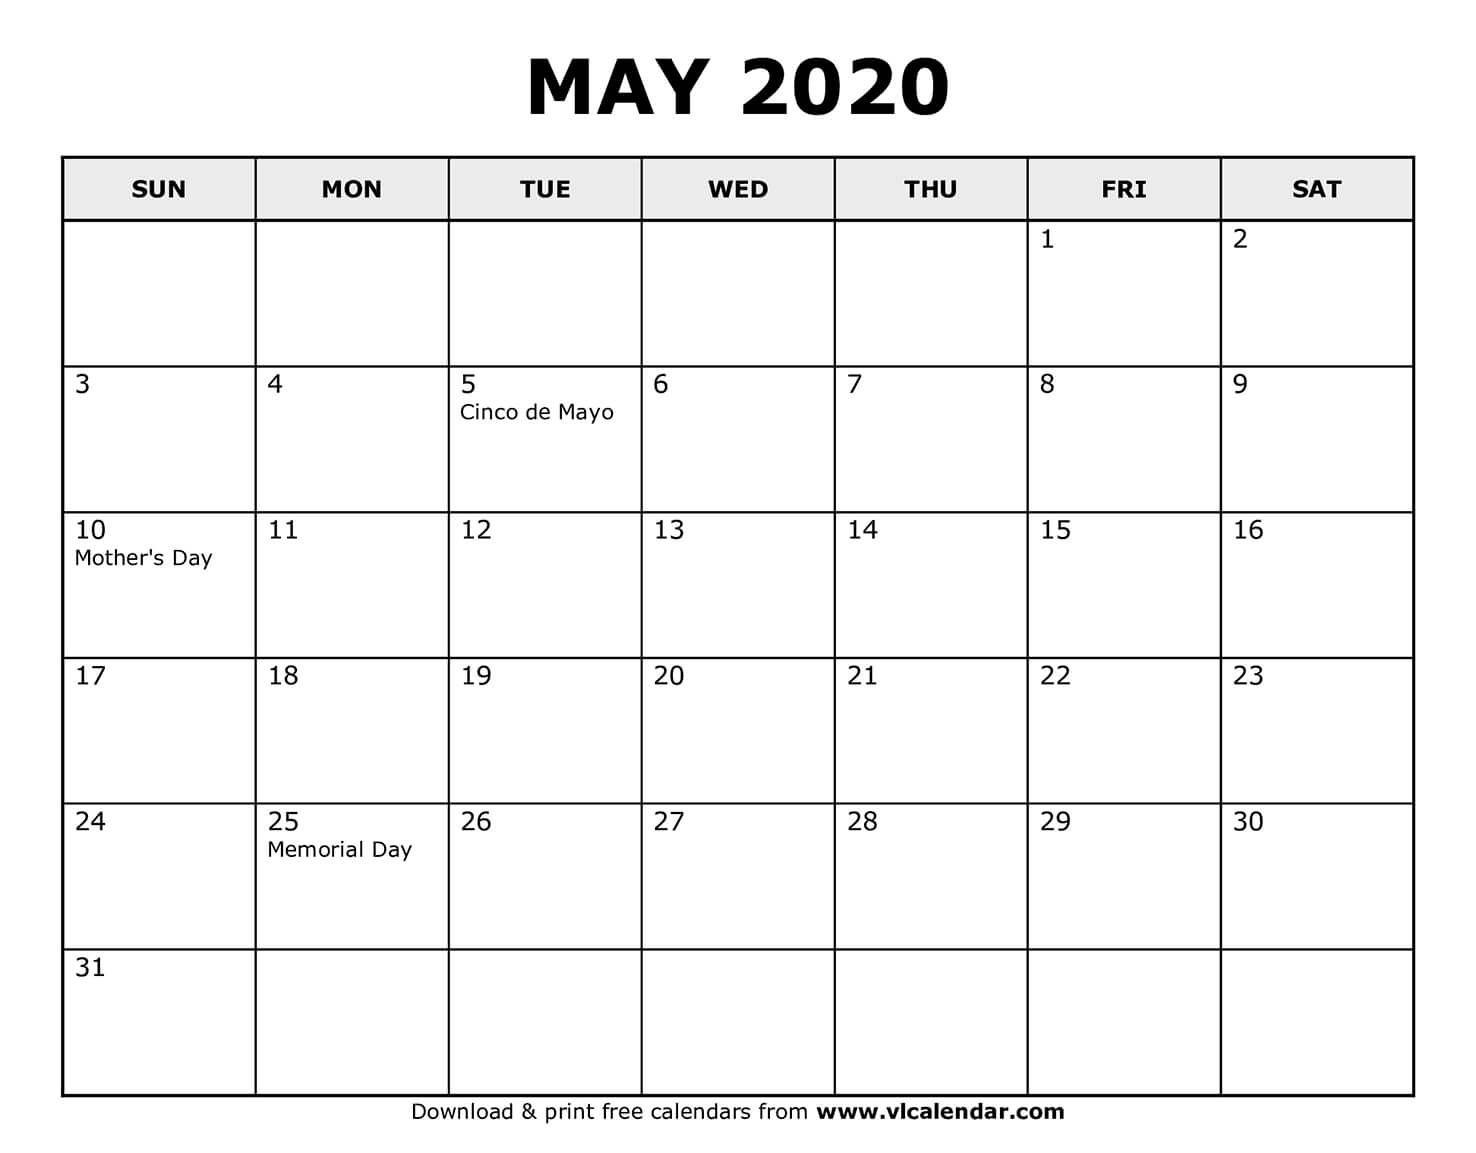 Printable May 2020 Calendars | Syndication Cloud